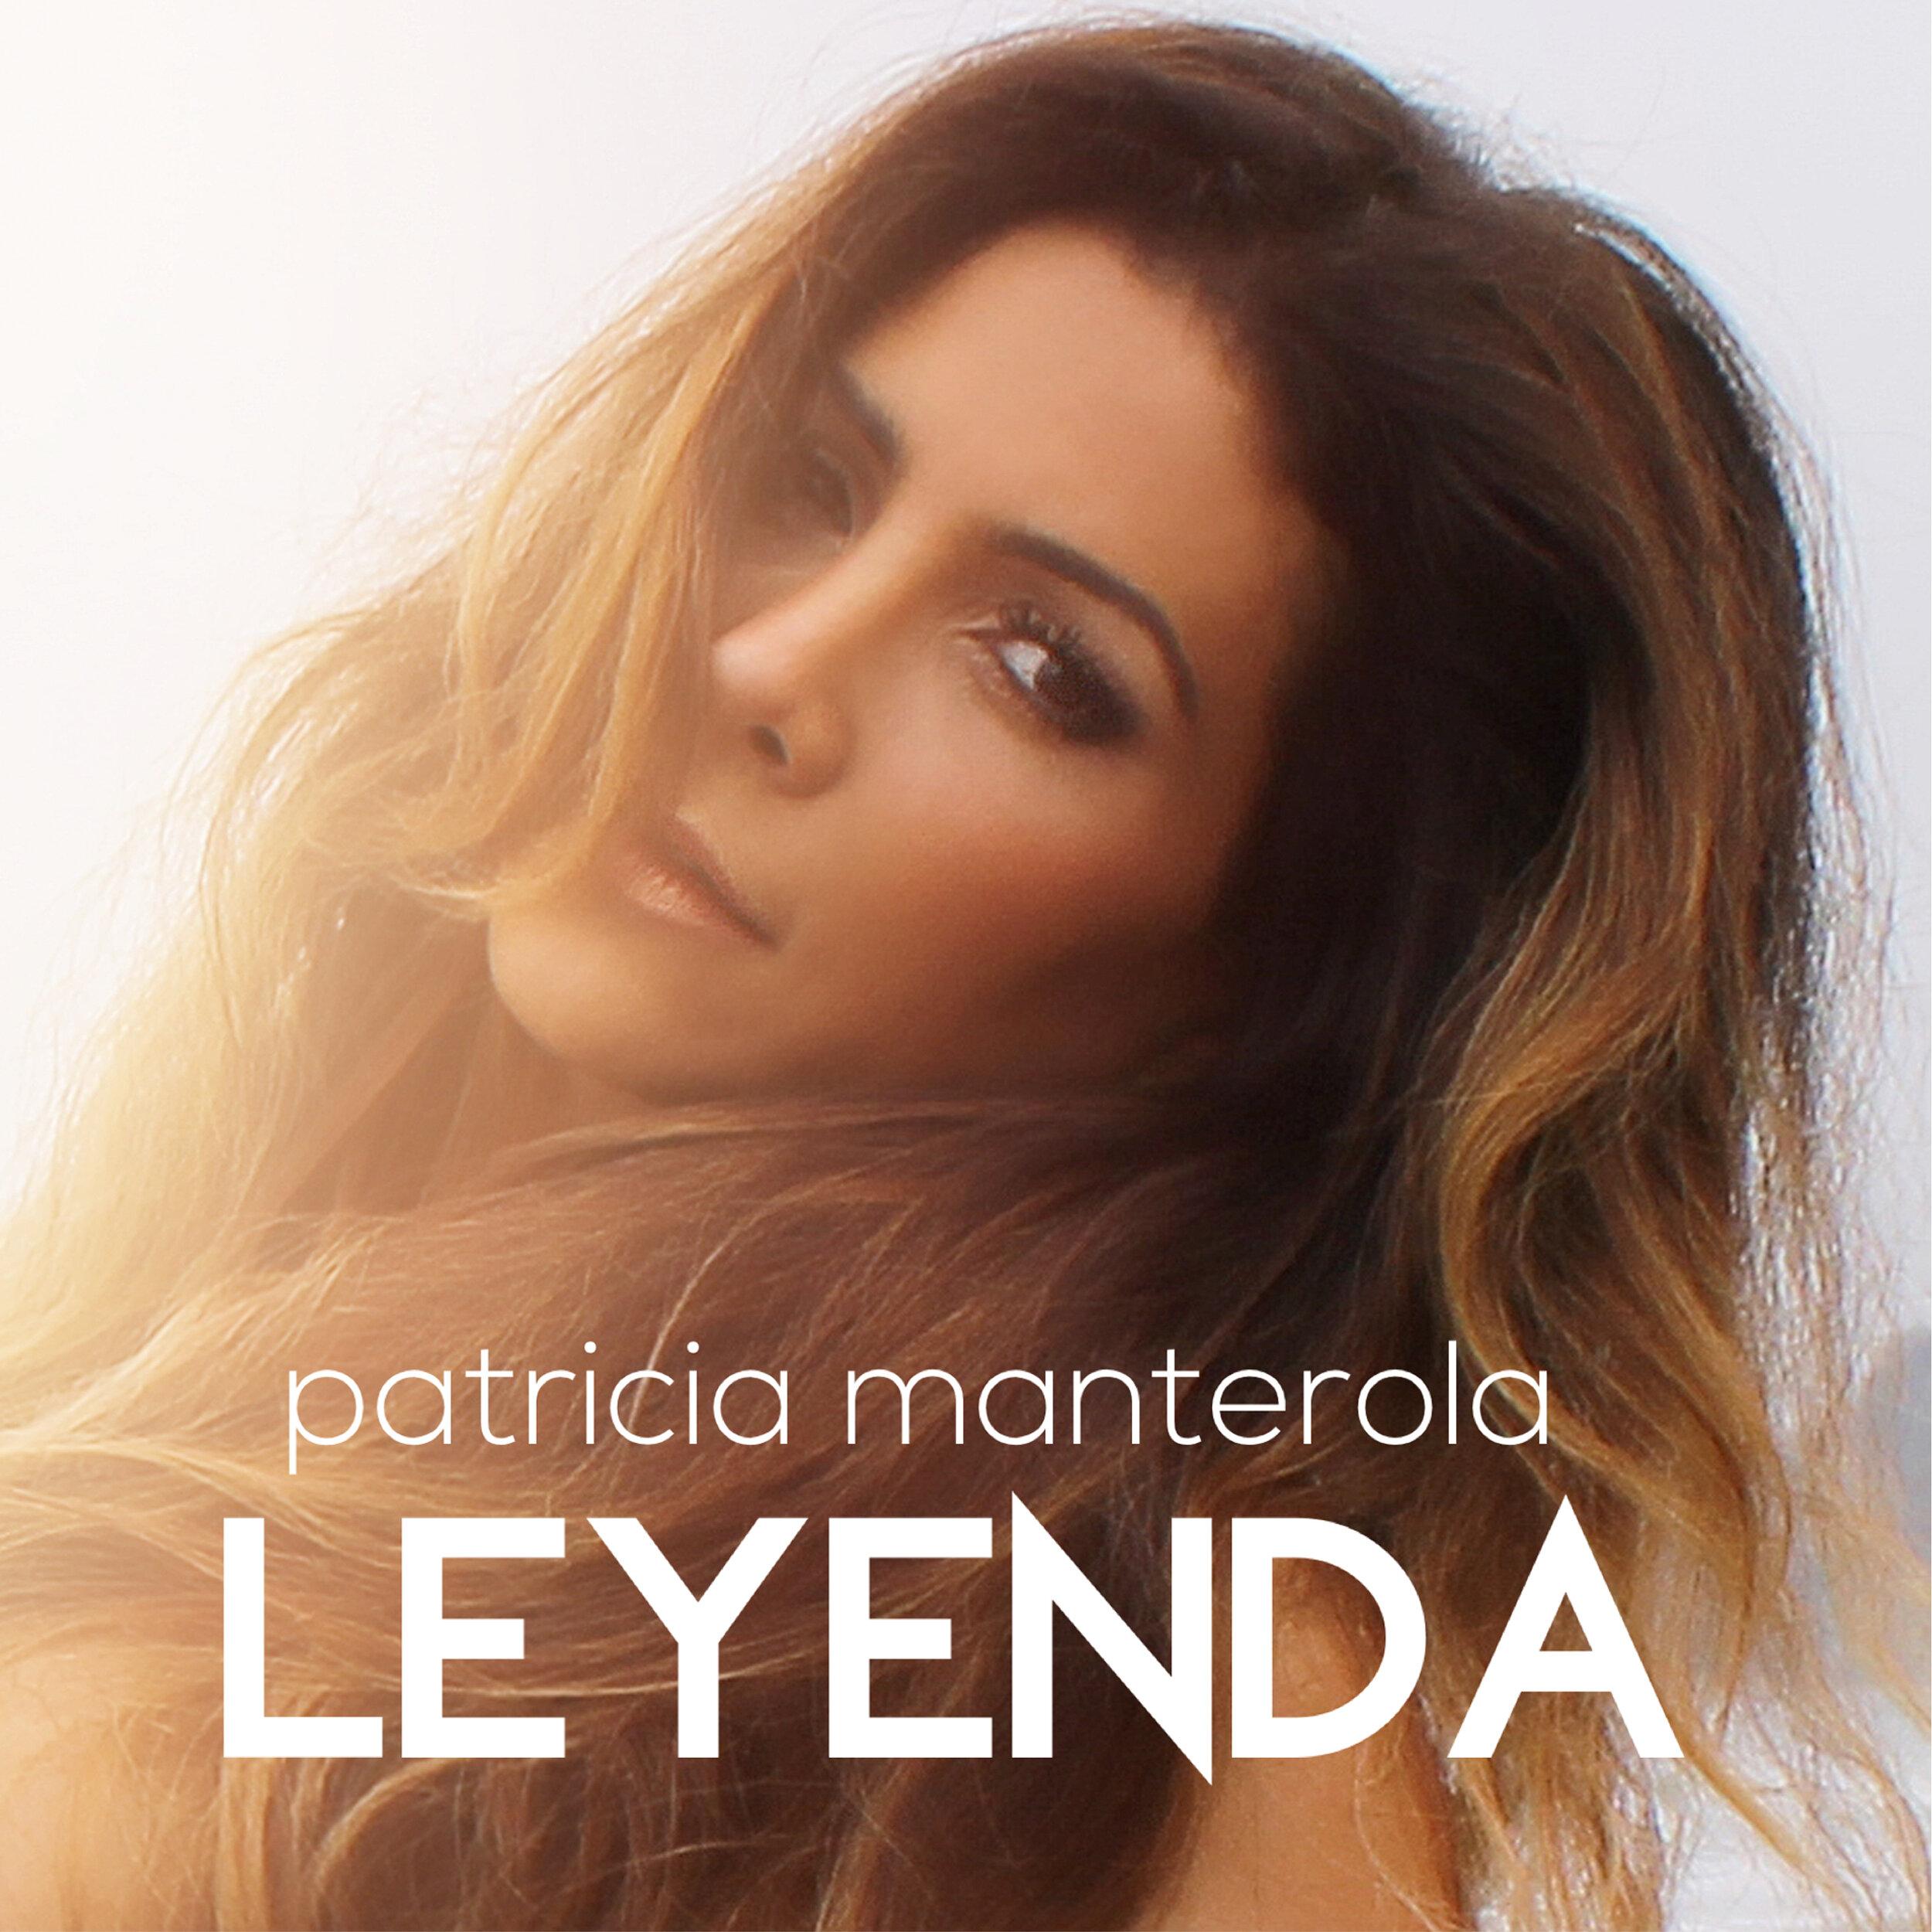 LeyendaCoverArtPatriciaManterola.jpg